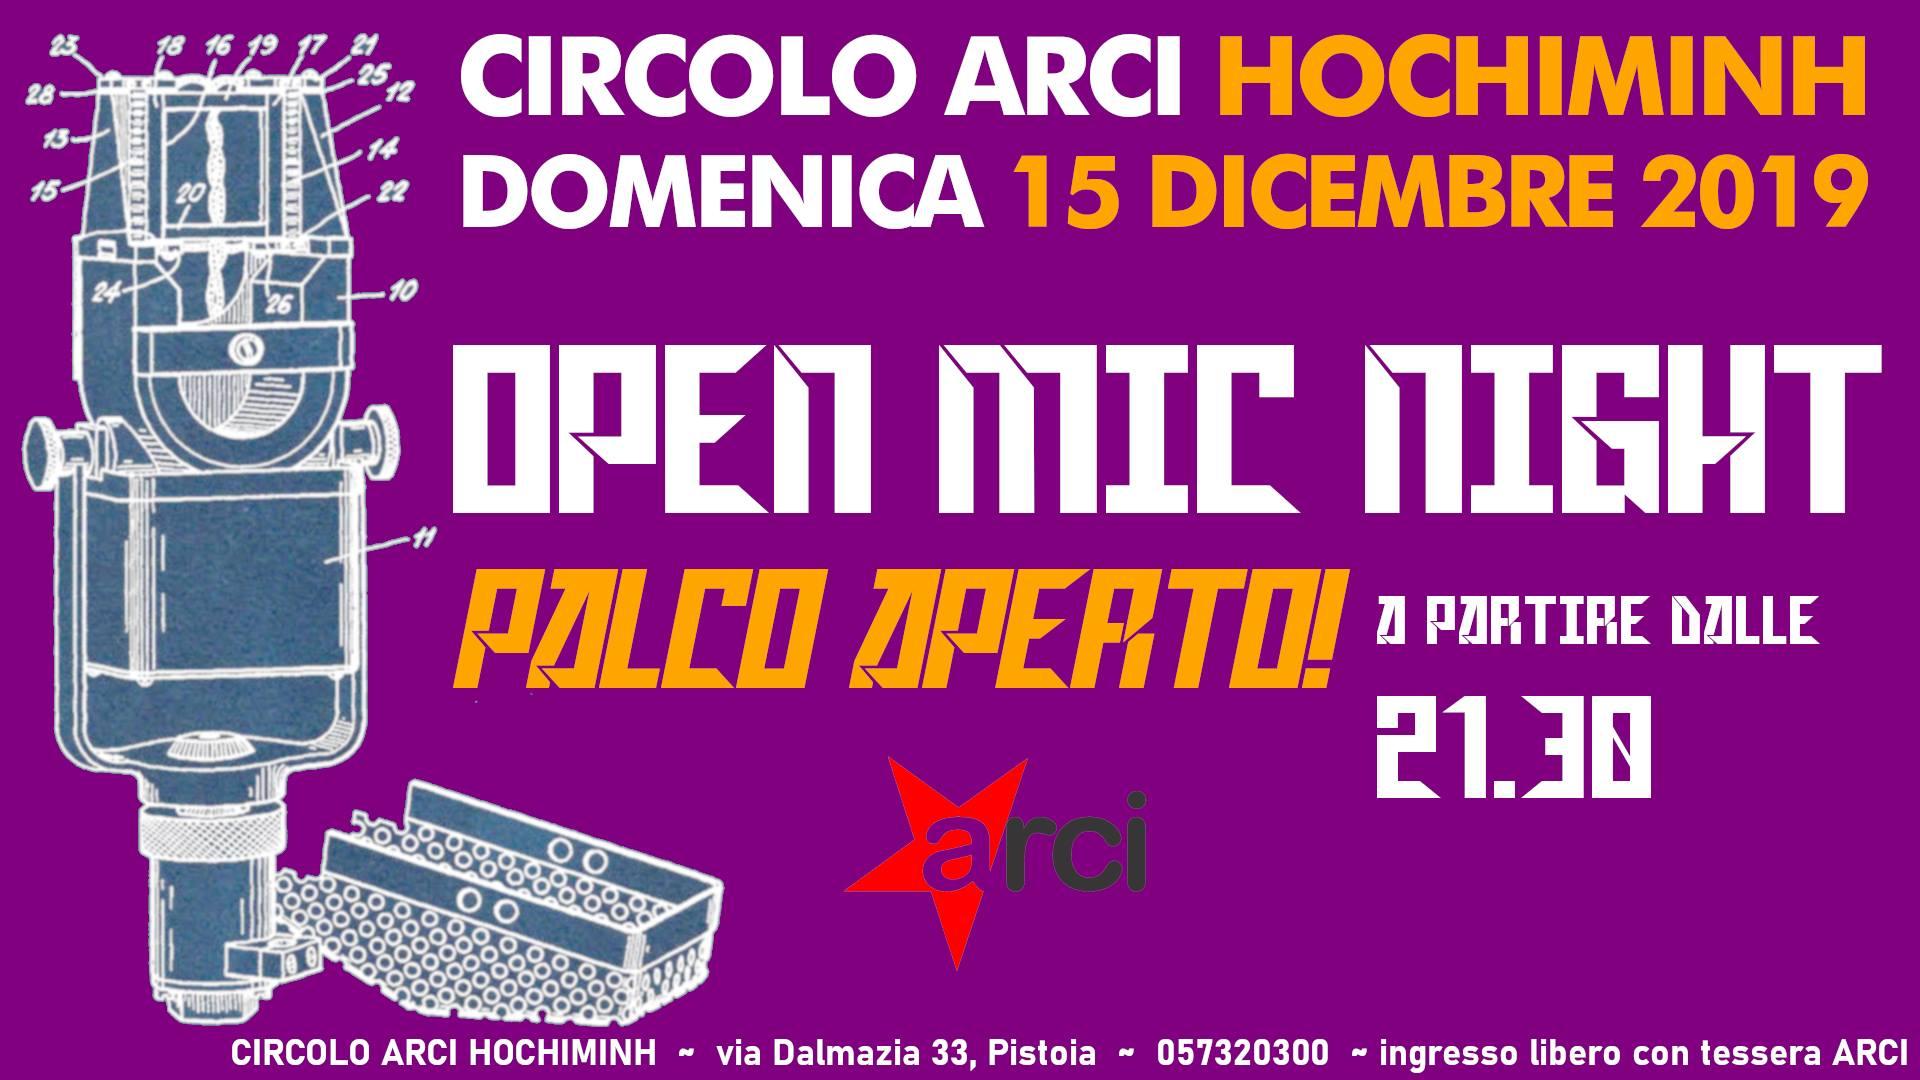 OPEN MIC NIGHT – Palco Aperto!